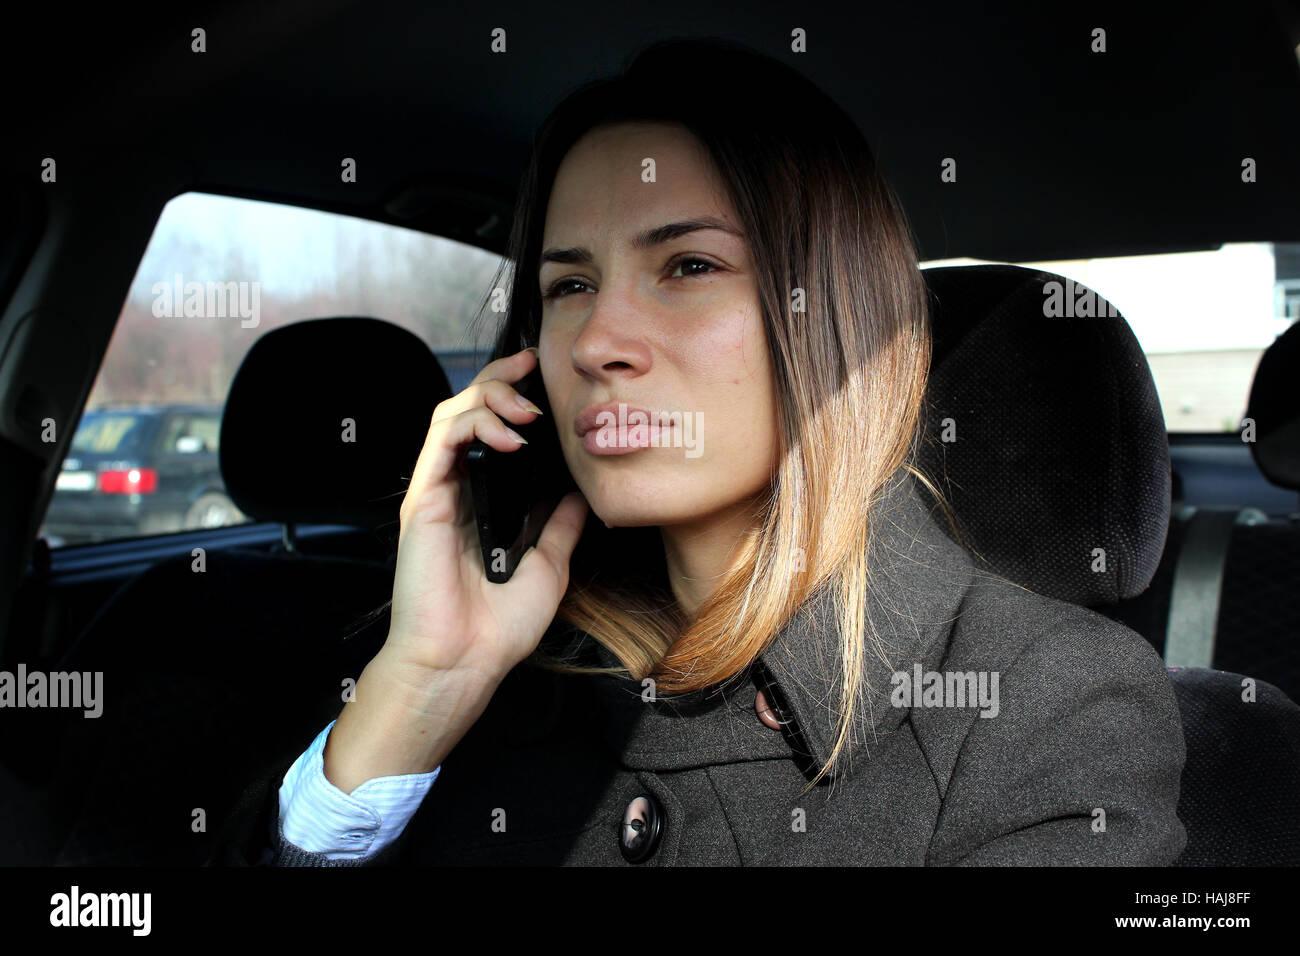 Girl car telephon - Stock Image